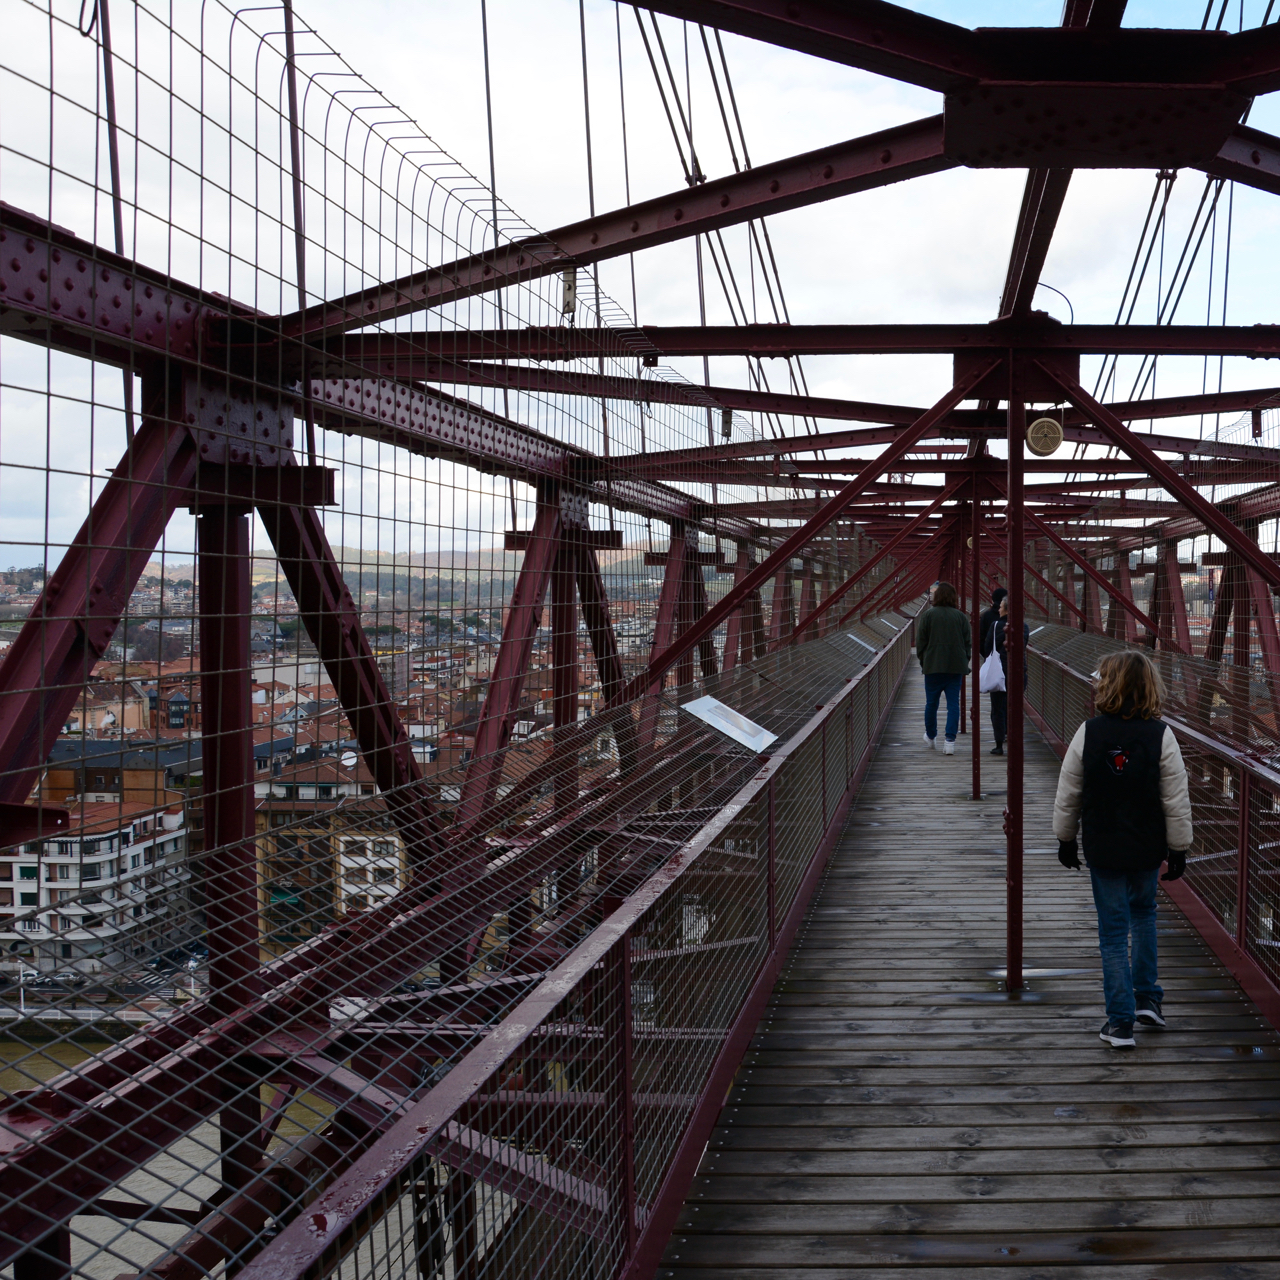 bridge vizkaya portugalete bilbao